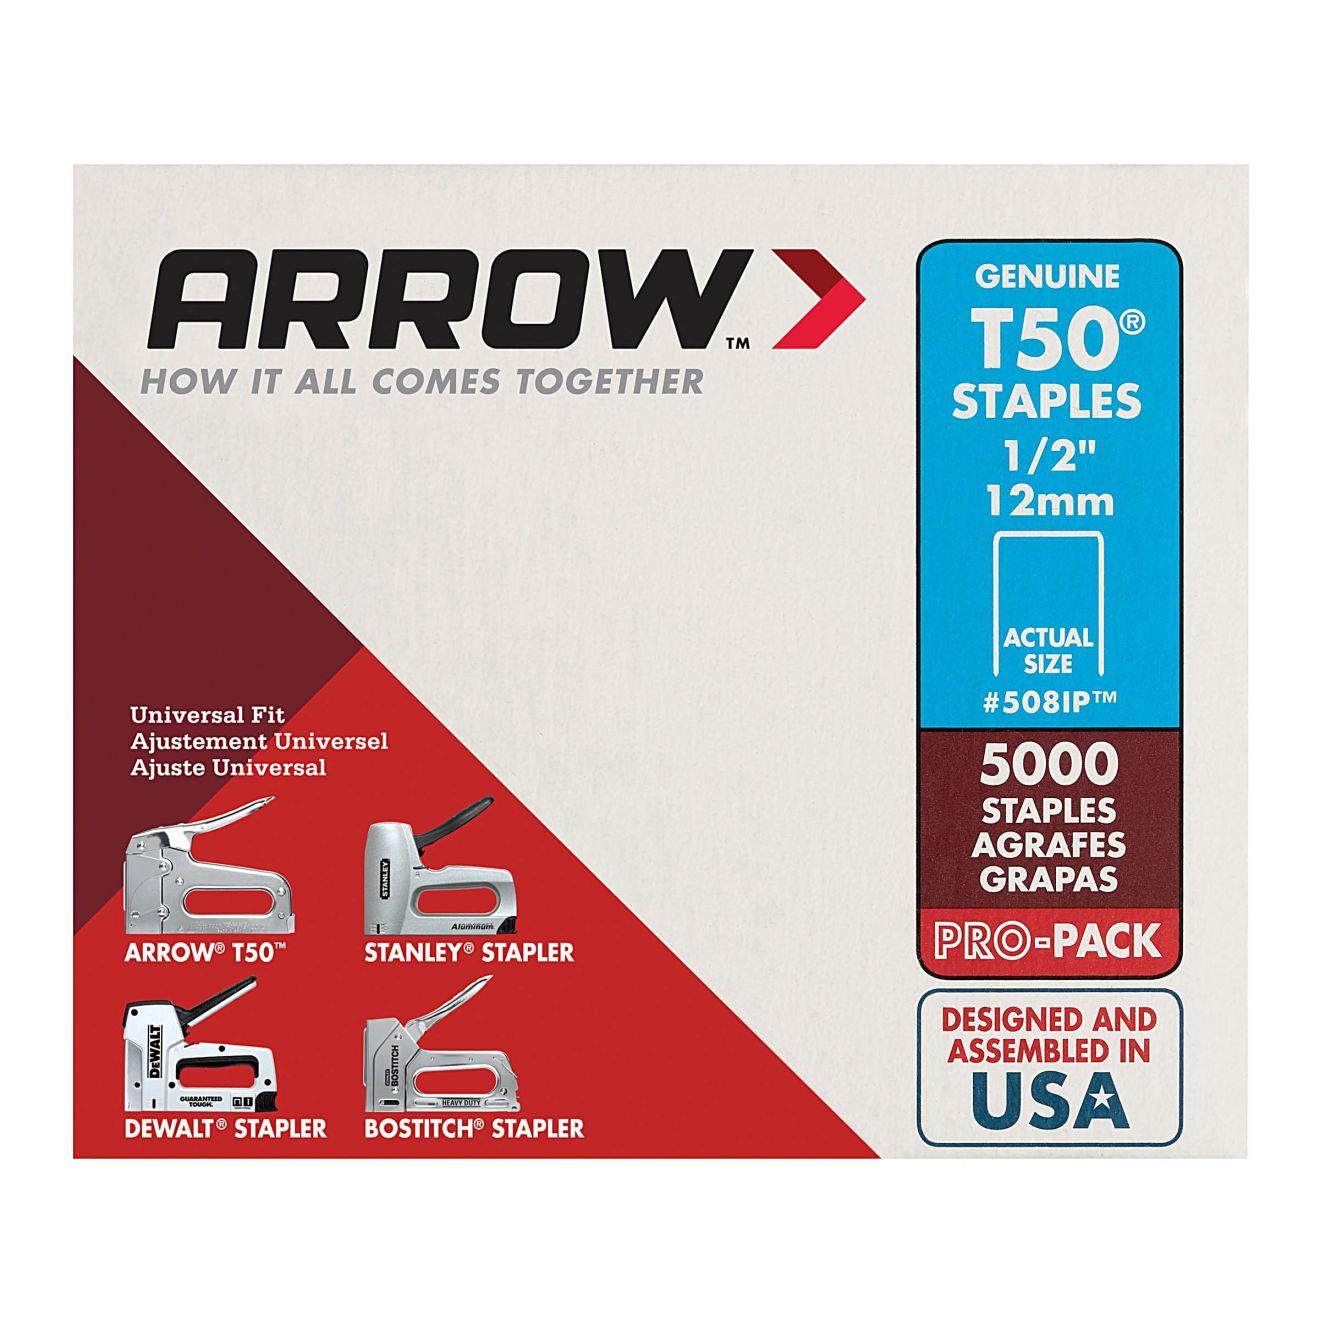 Arrow T50 1/2 in. Staples (5000-Pack)